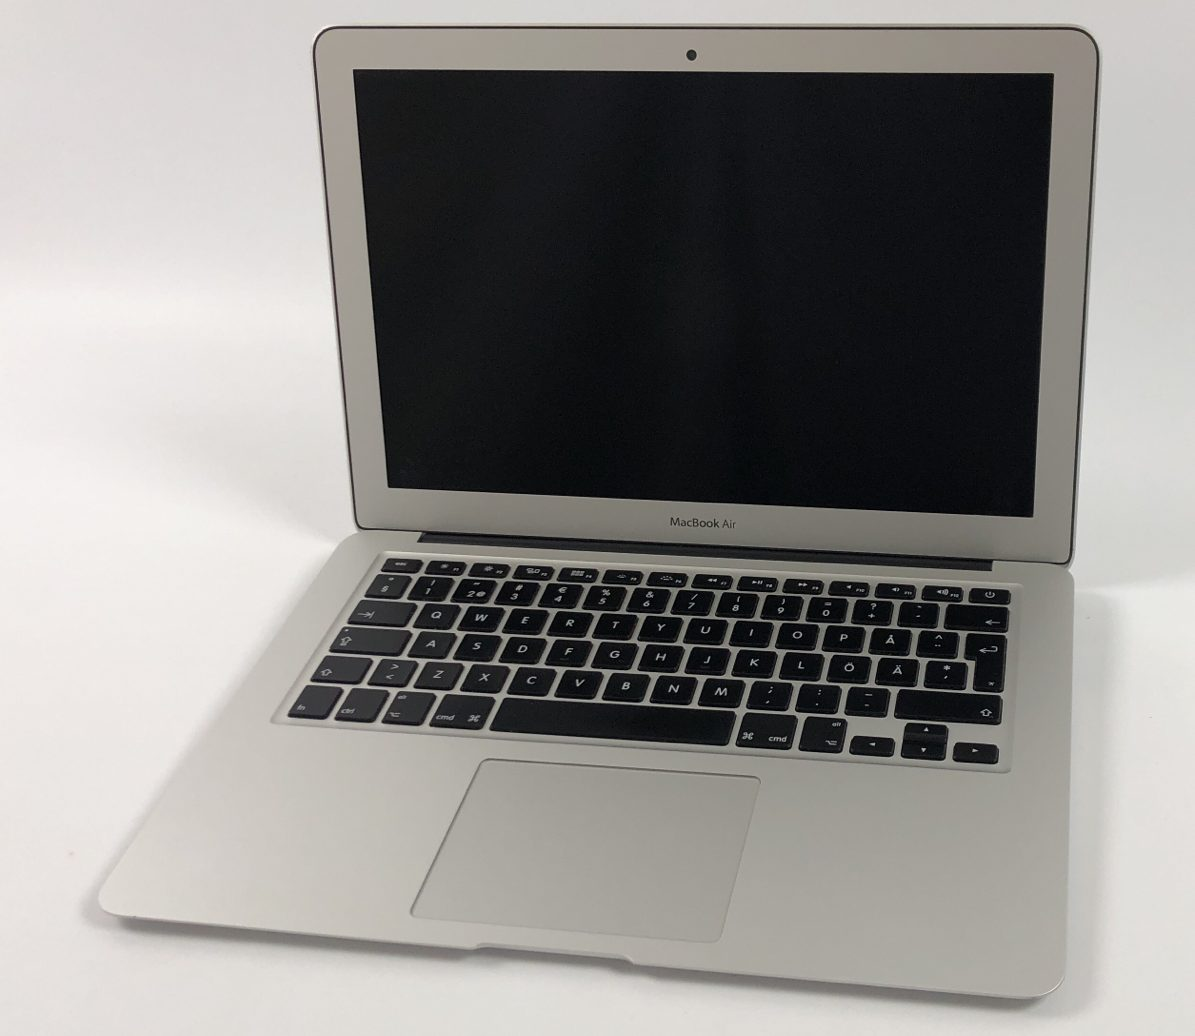 "MacBook Air 13"" Early 2015 (Intel Core i5 1.6 GHz 8 GB RAM 256 GB SSD), Intel Core i5 1.6 GHz, 8 GB RAM, 256 GB SSD, image 1"